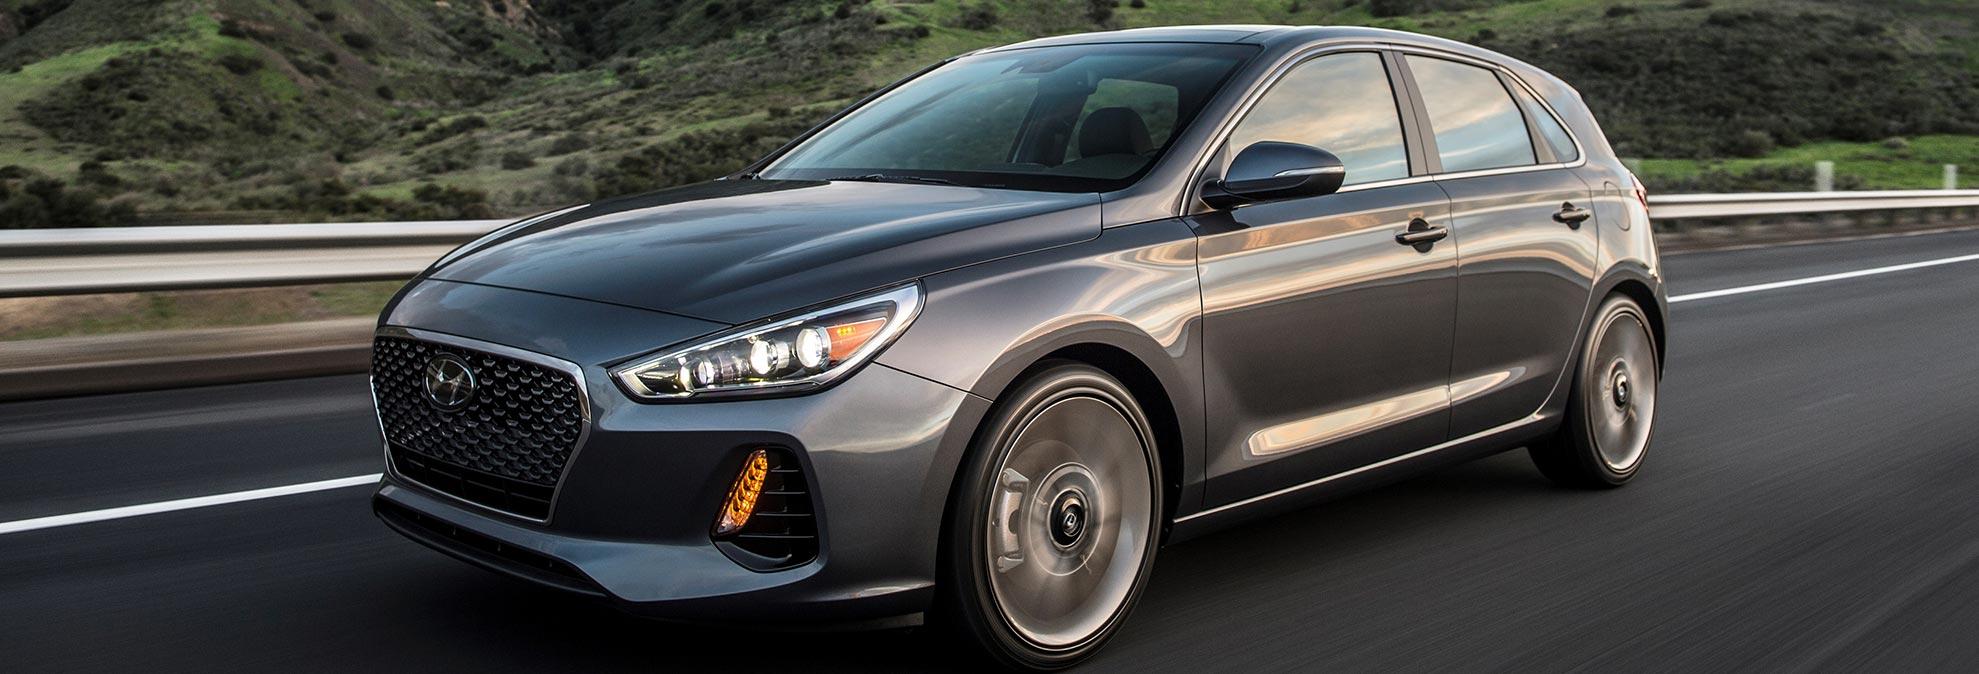 hatchback photo fuel transmission depth reviews review elantra s in driver hyundai economy car page model engine and original